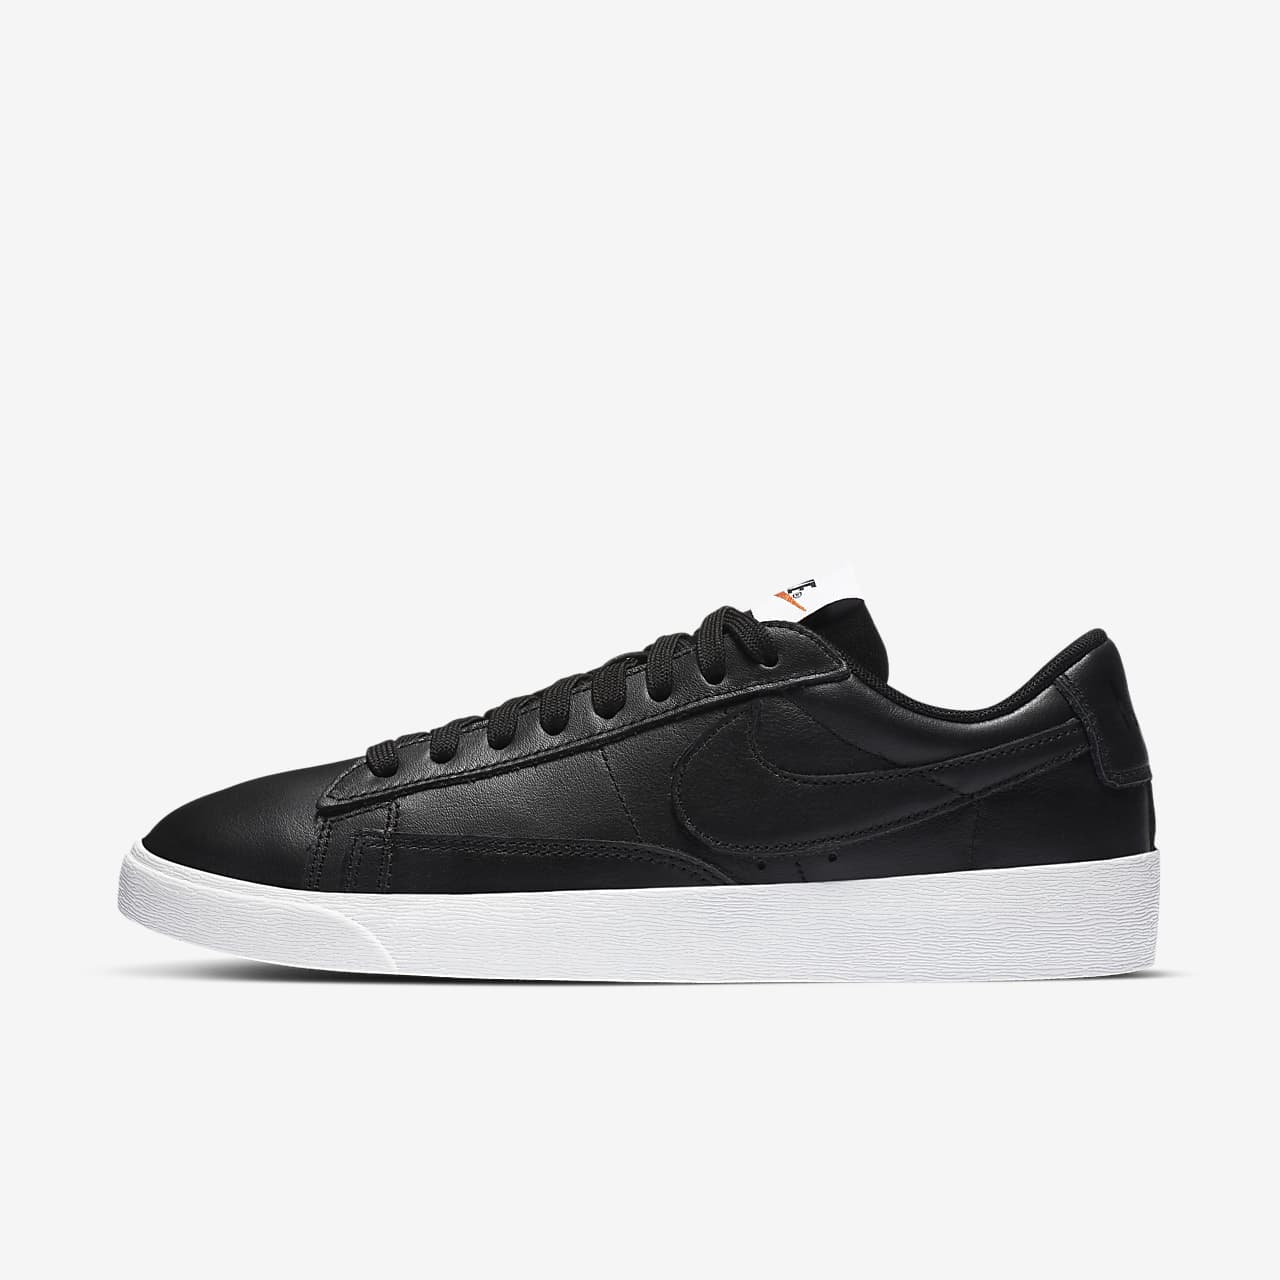 c785a23858885 Nike Blazer Low LE Women's Shoe. Nike.com SE